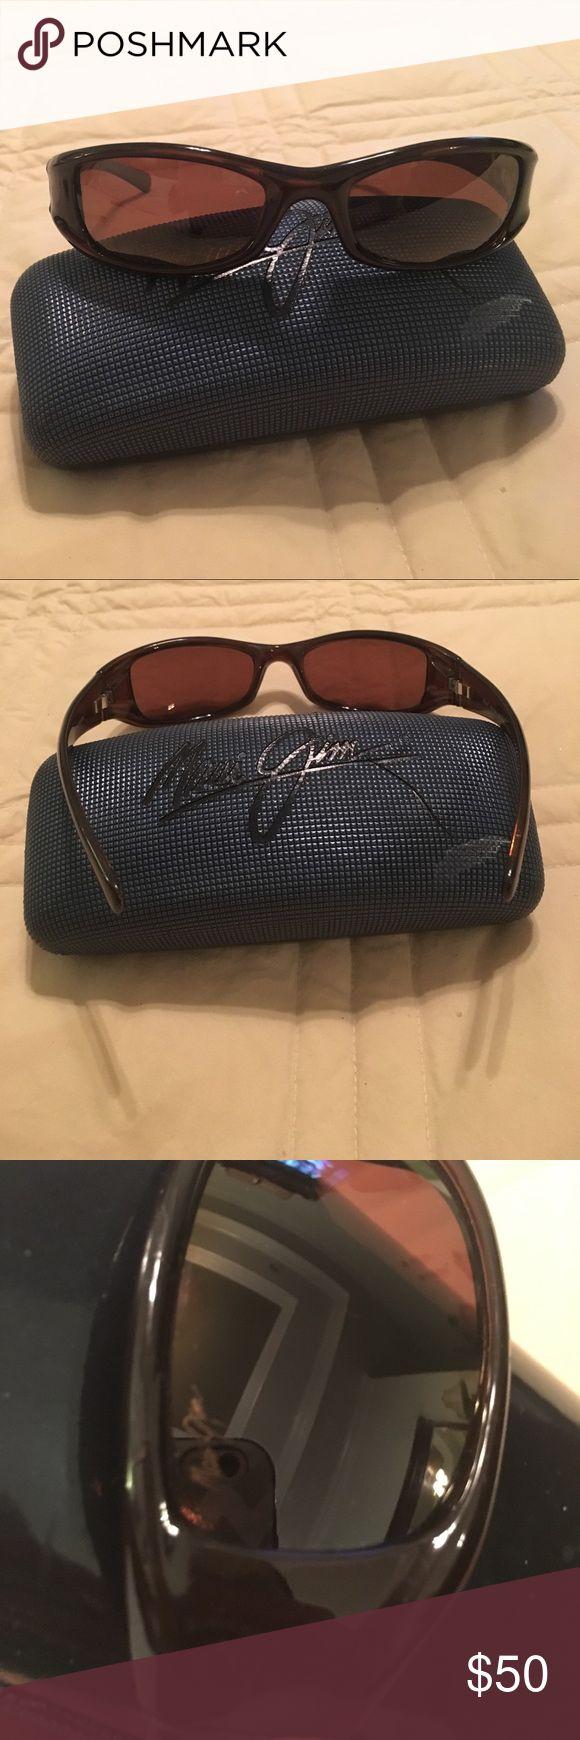 Maui Jim sunglasses Like new Maui Jim sunglasses. Maui Jim Accessories Sunglasses